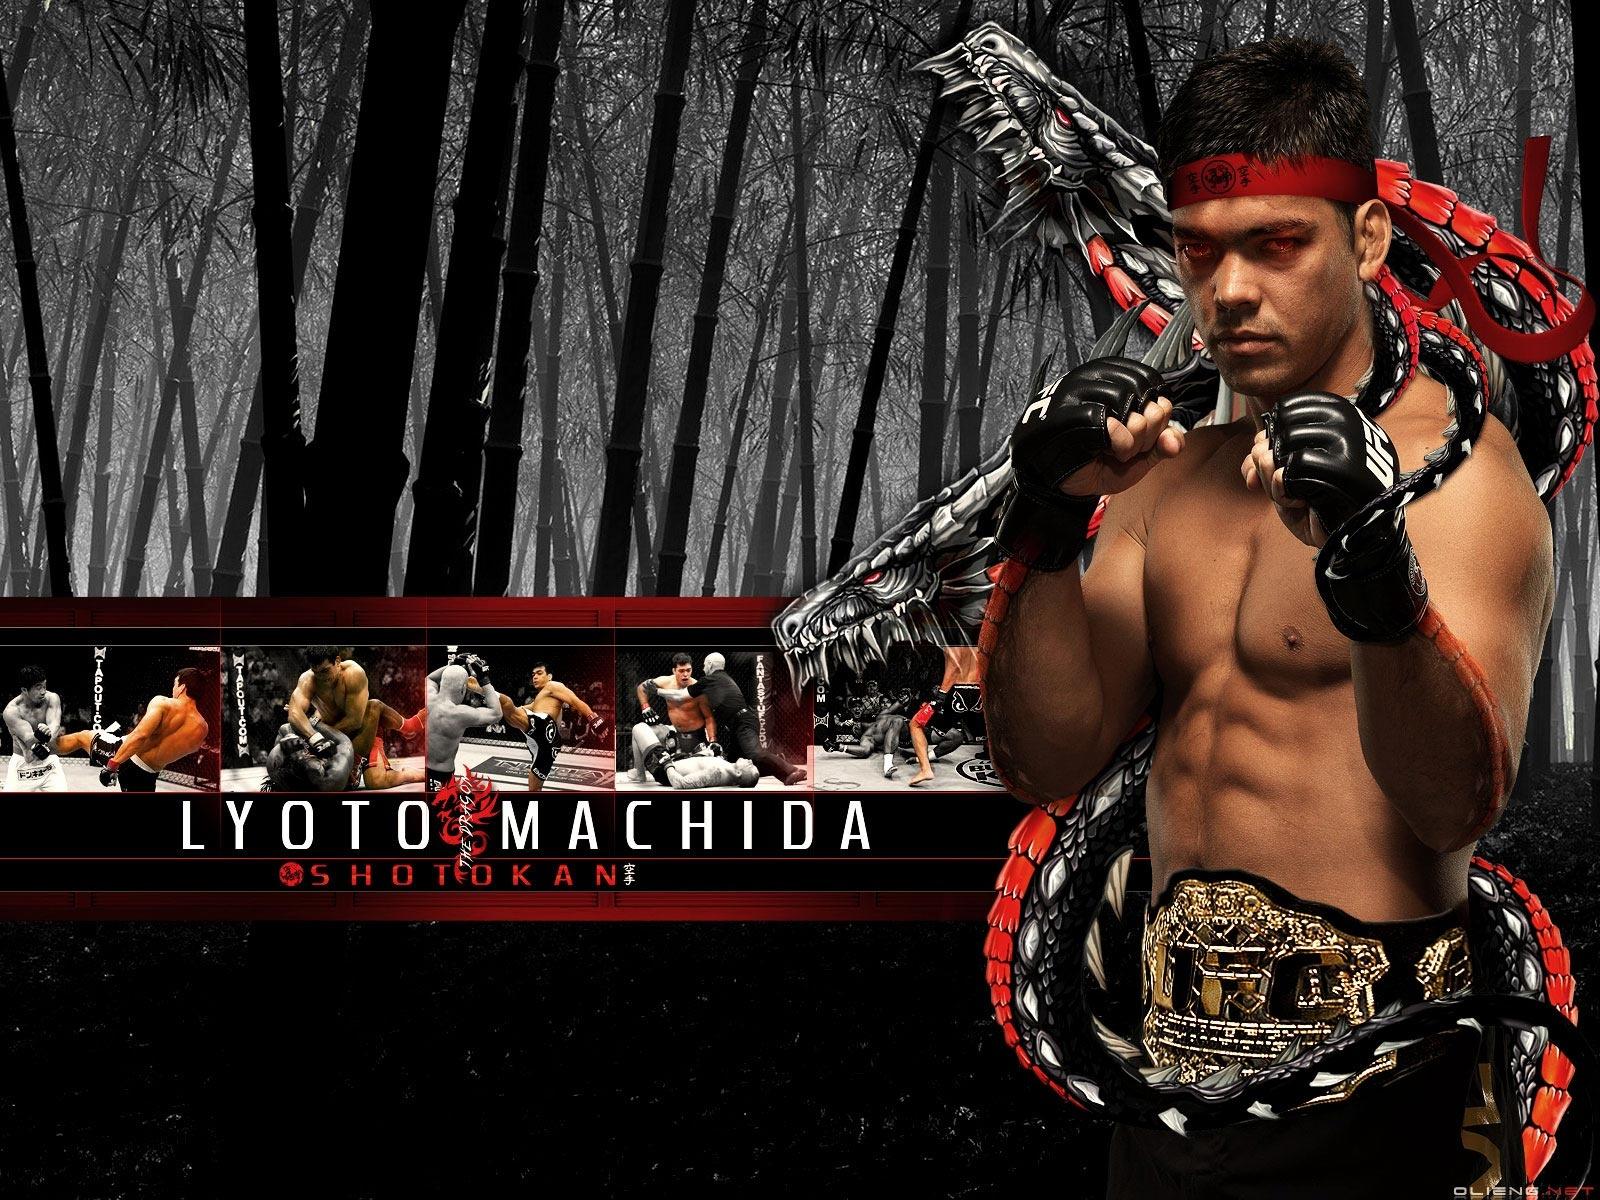 machida UFC mixed martial arts mma fight extreme wallpaper background 1600x1200